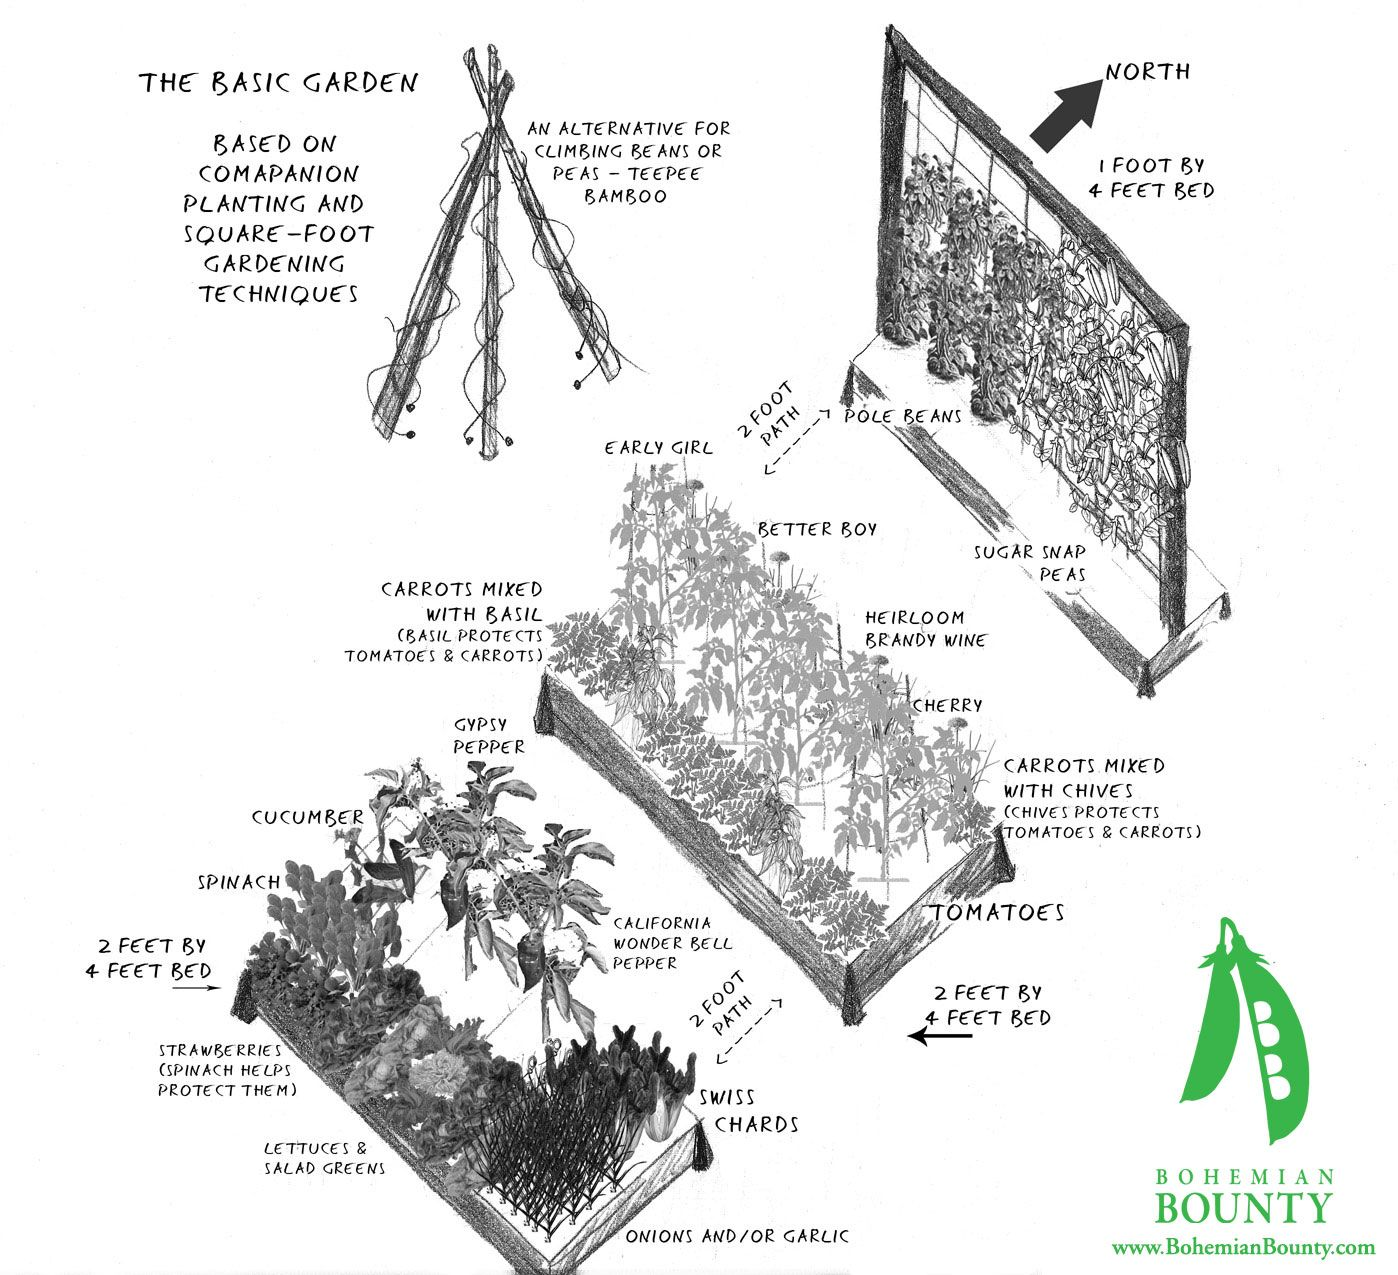 Pin By Jessica Jordan On Raised Garden Design